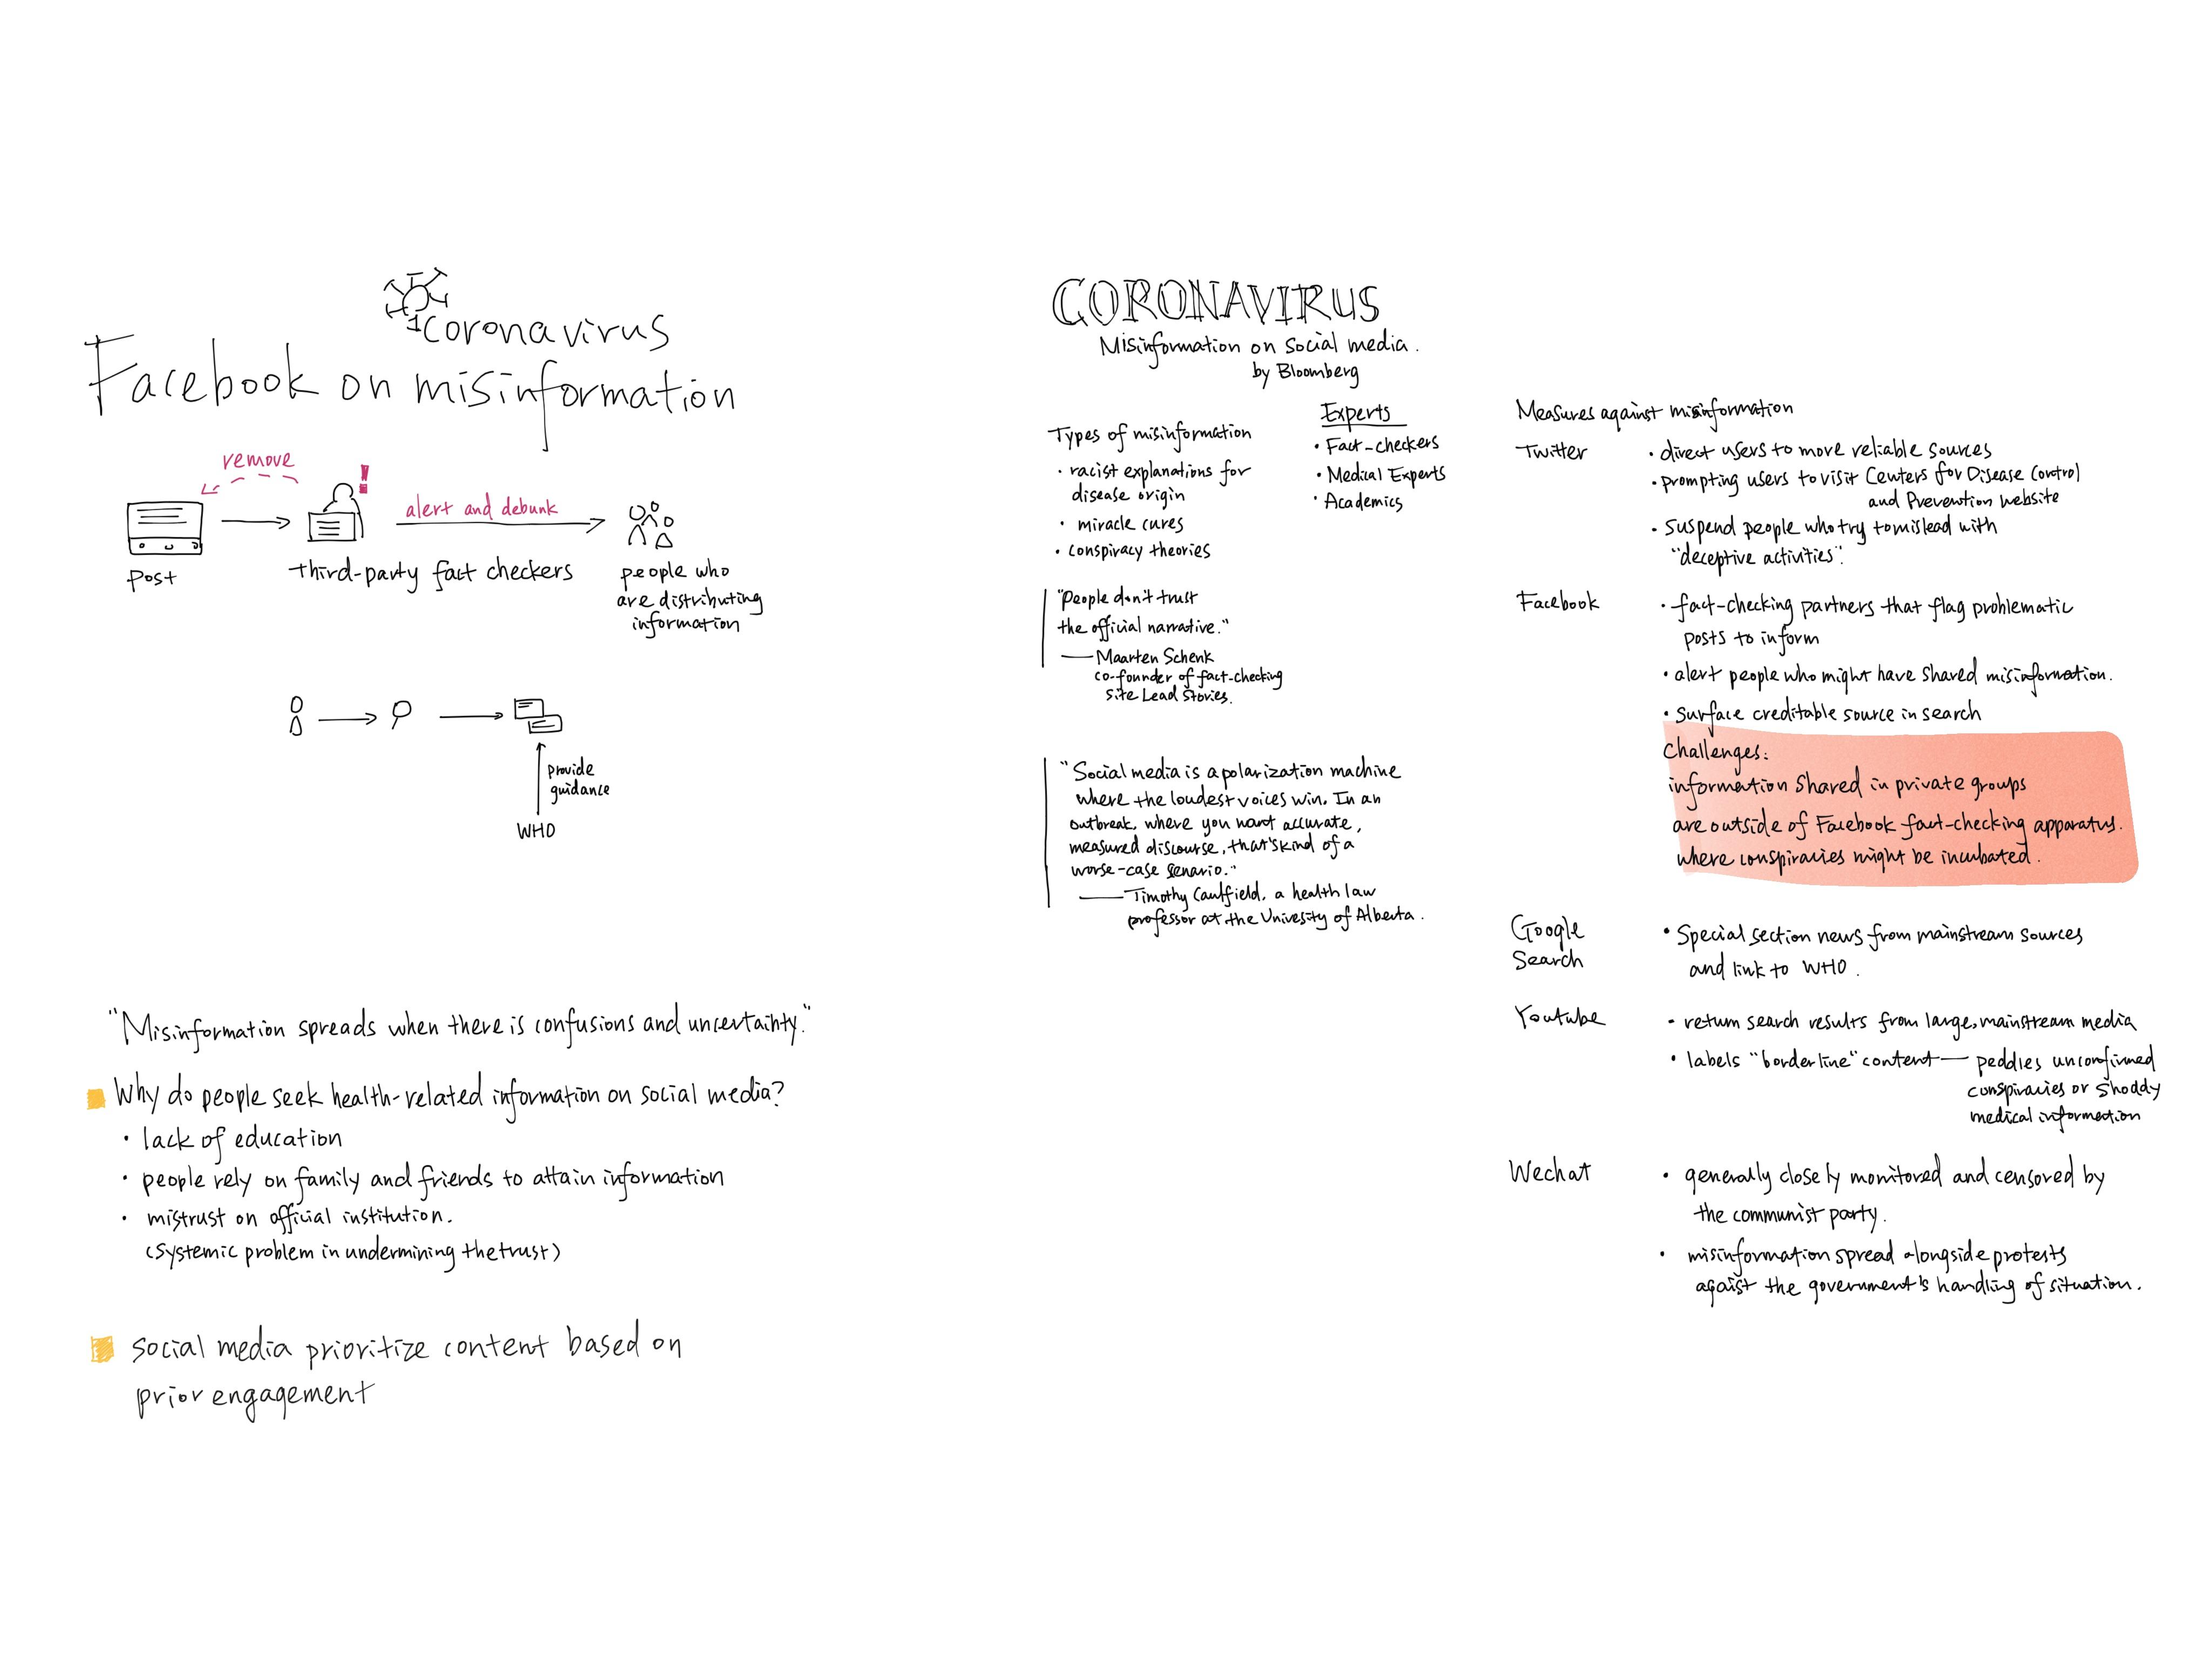 Coronavirus Misinformation Sketchnotes @Tara Lin